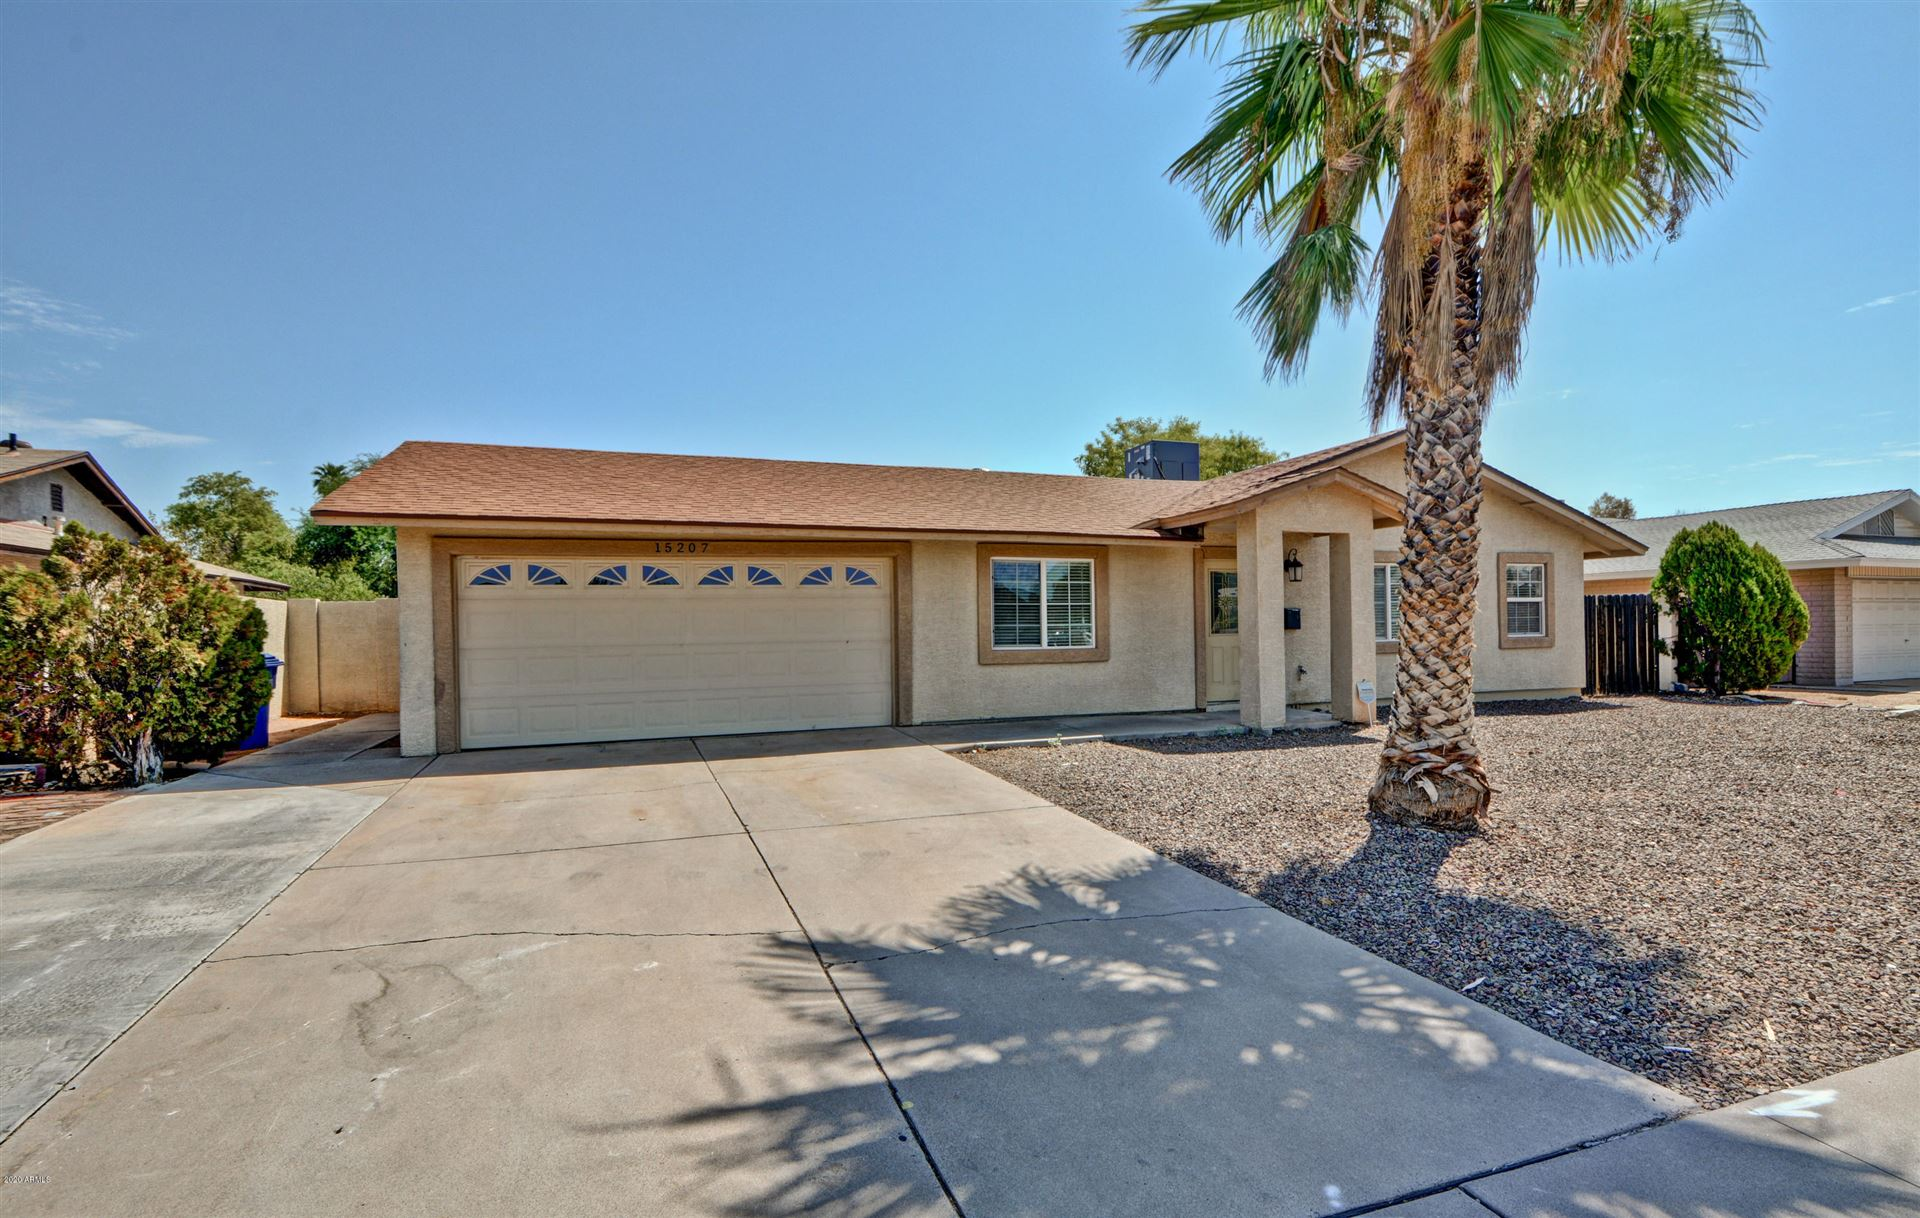 15207 N 37TH Avenue, Phoenix, AZ 85053 - MLS#: 6128105